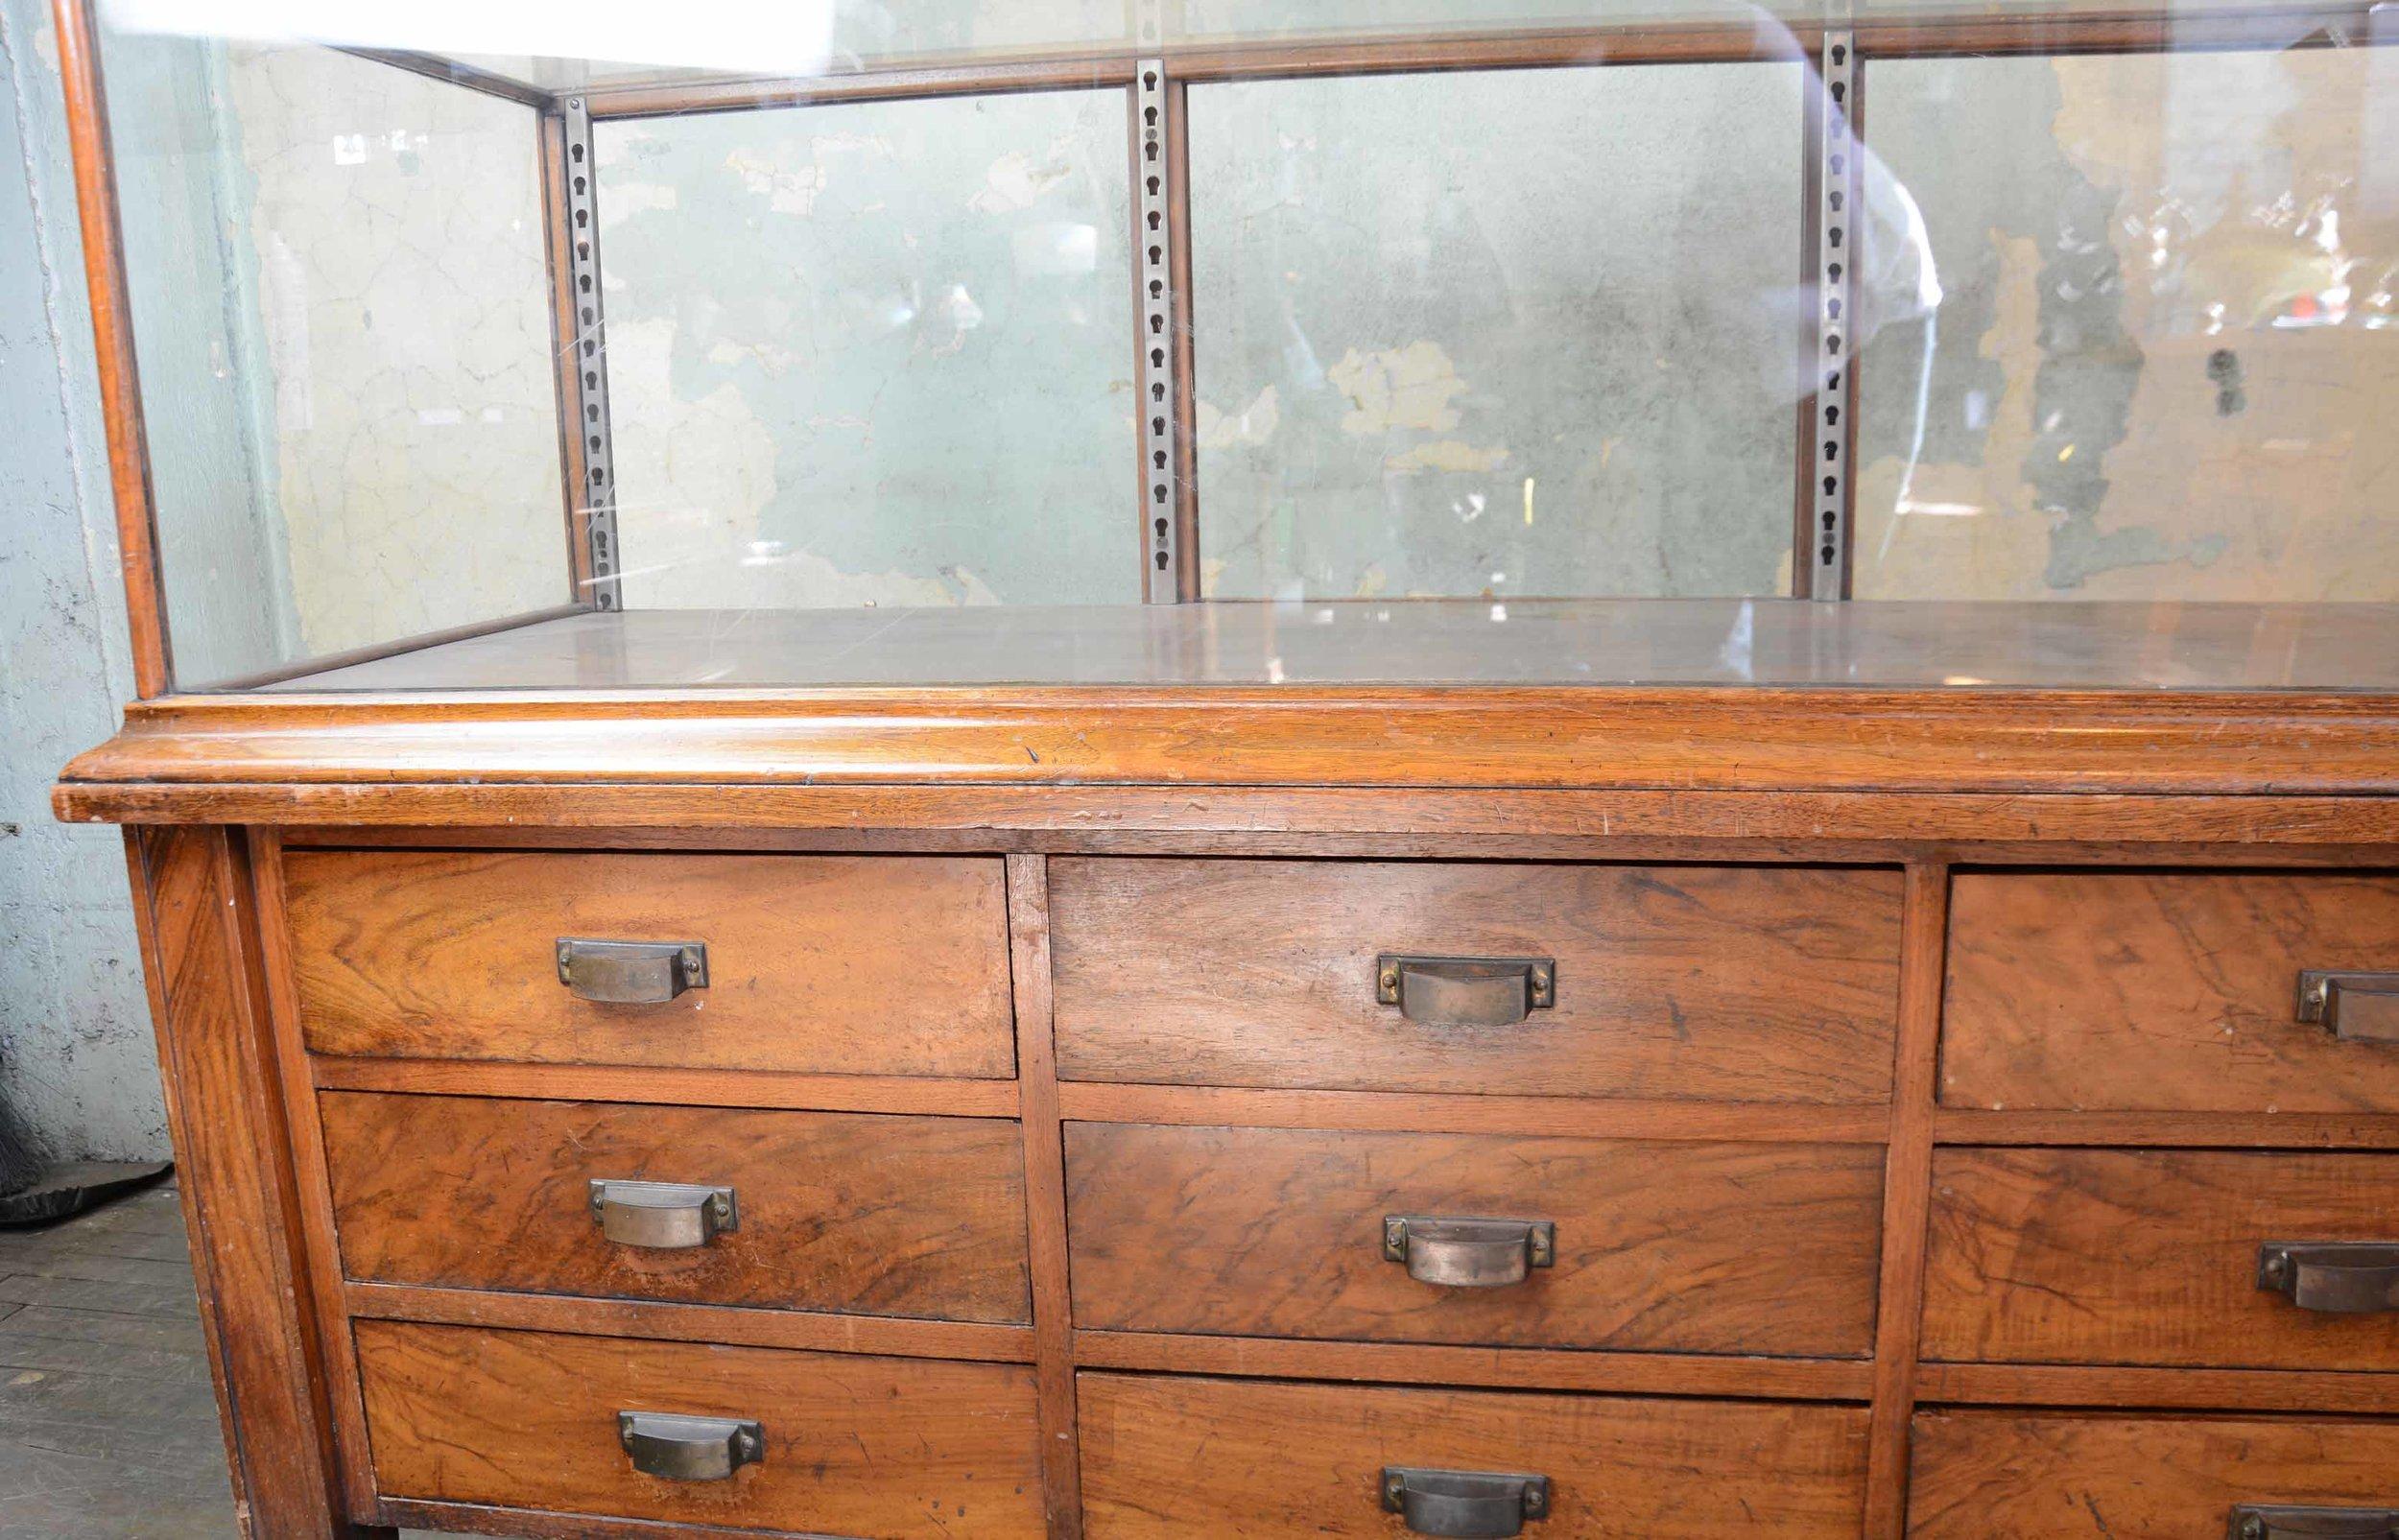 46917-display-case-with-drawers-CASE-DETAIL.jpg